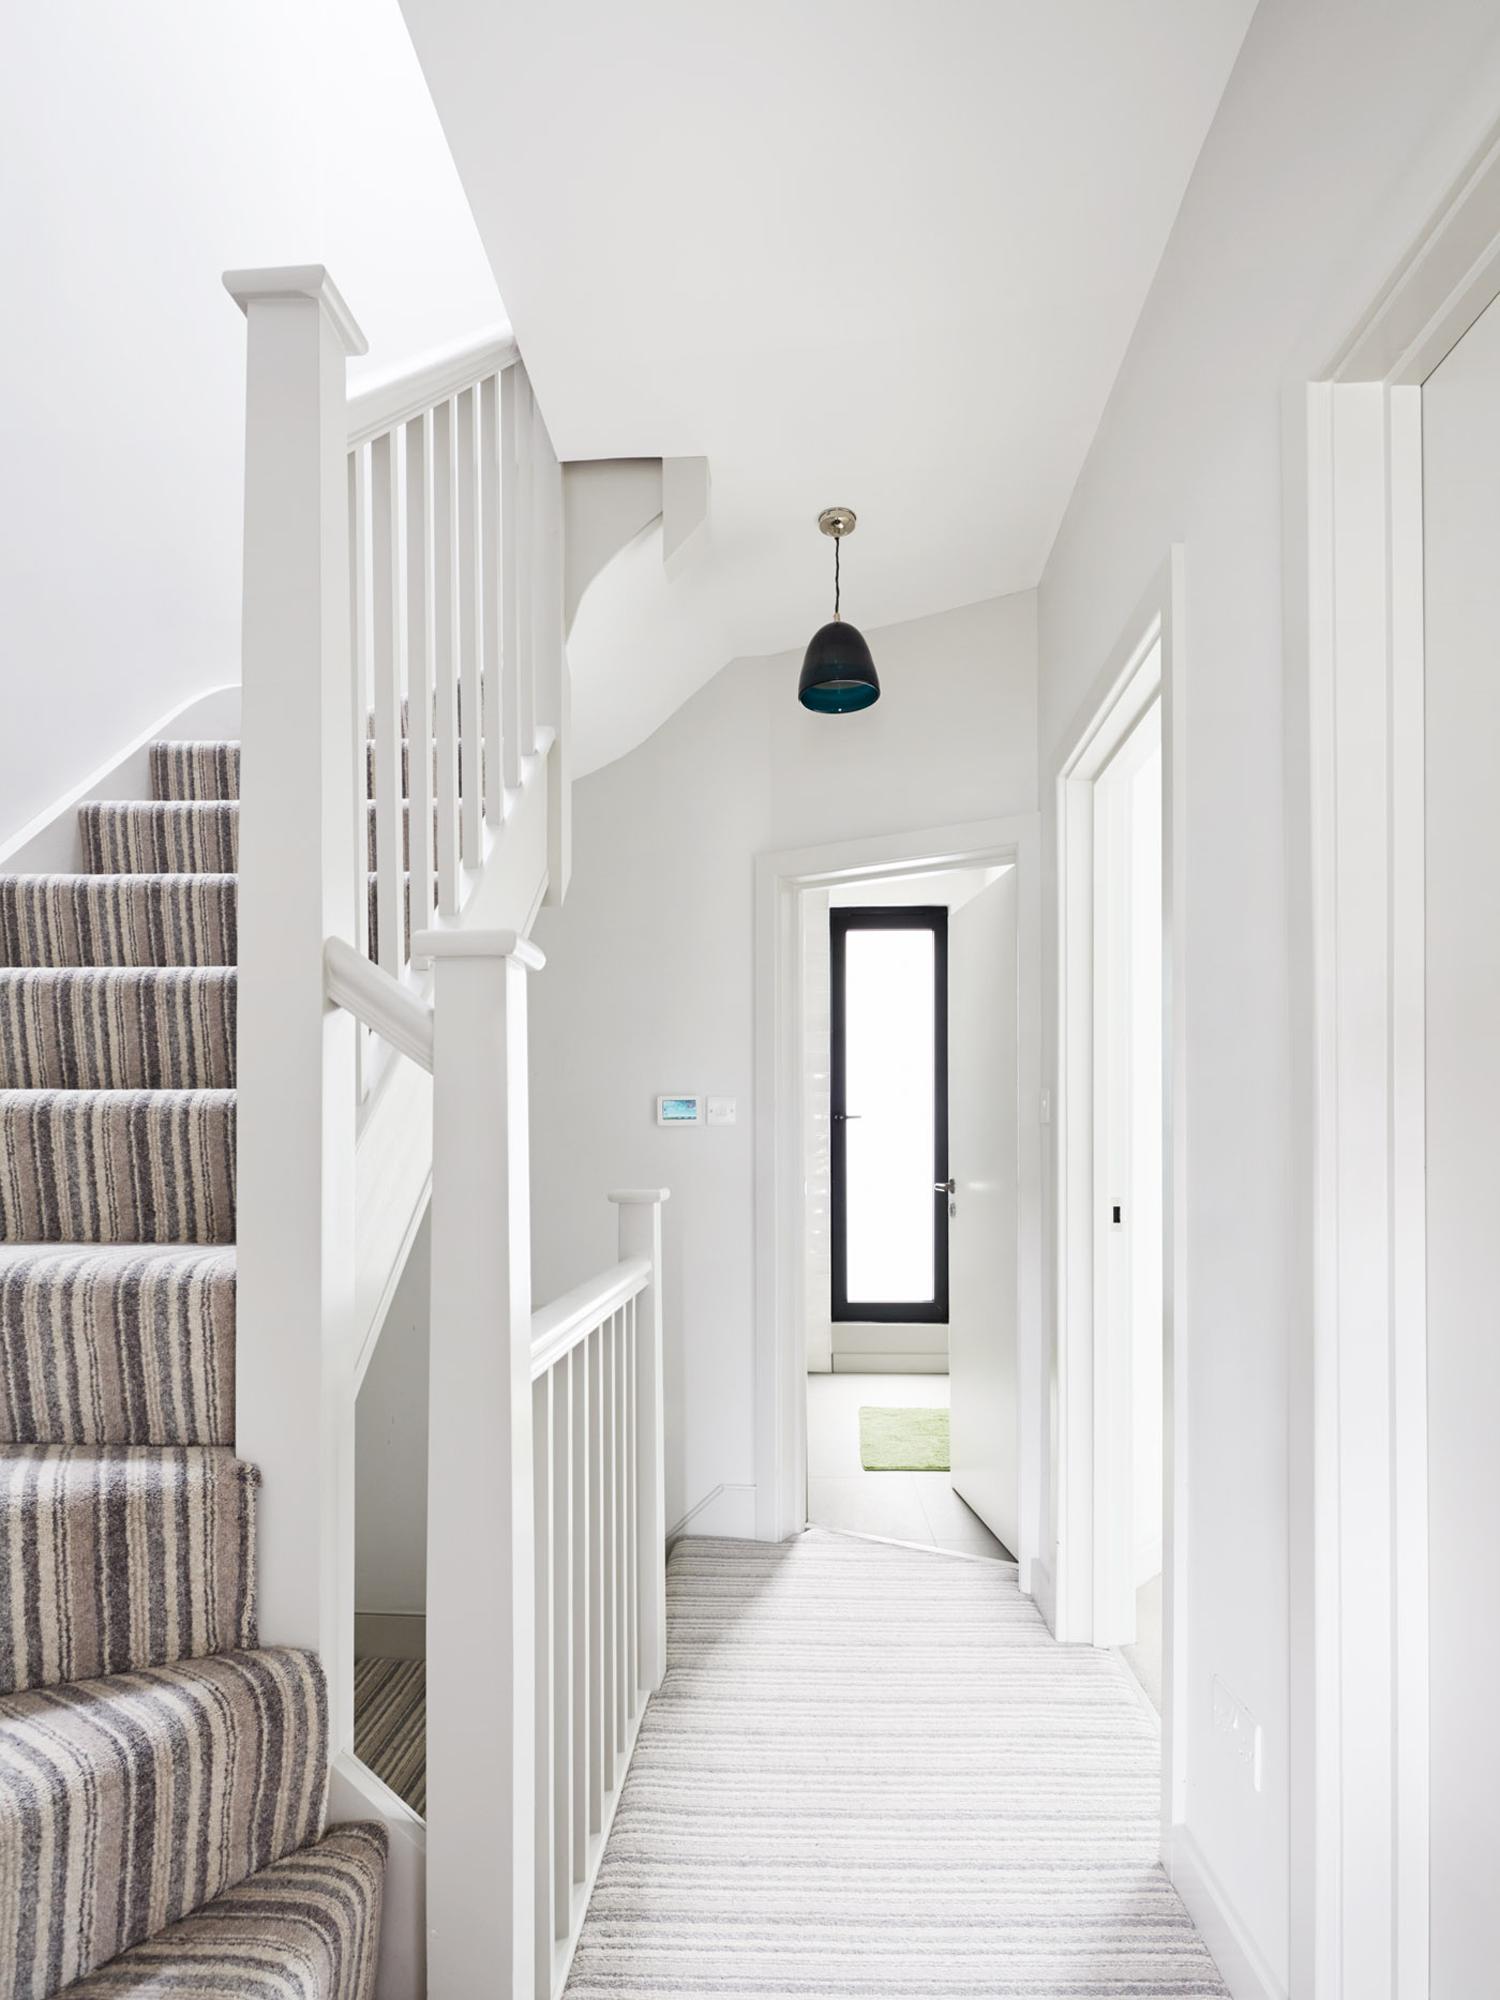 House C Staircase, Architecture, Interior design, Bonds Green, London, Extension, Refurbishment, Striped Carpet, Minimal, Clean, Modern, Elegant, White Interior, Steel Window, Duration